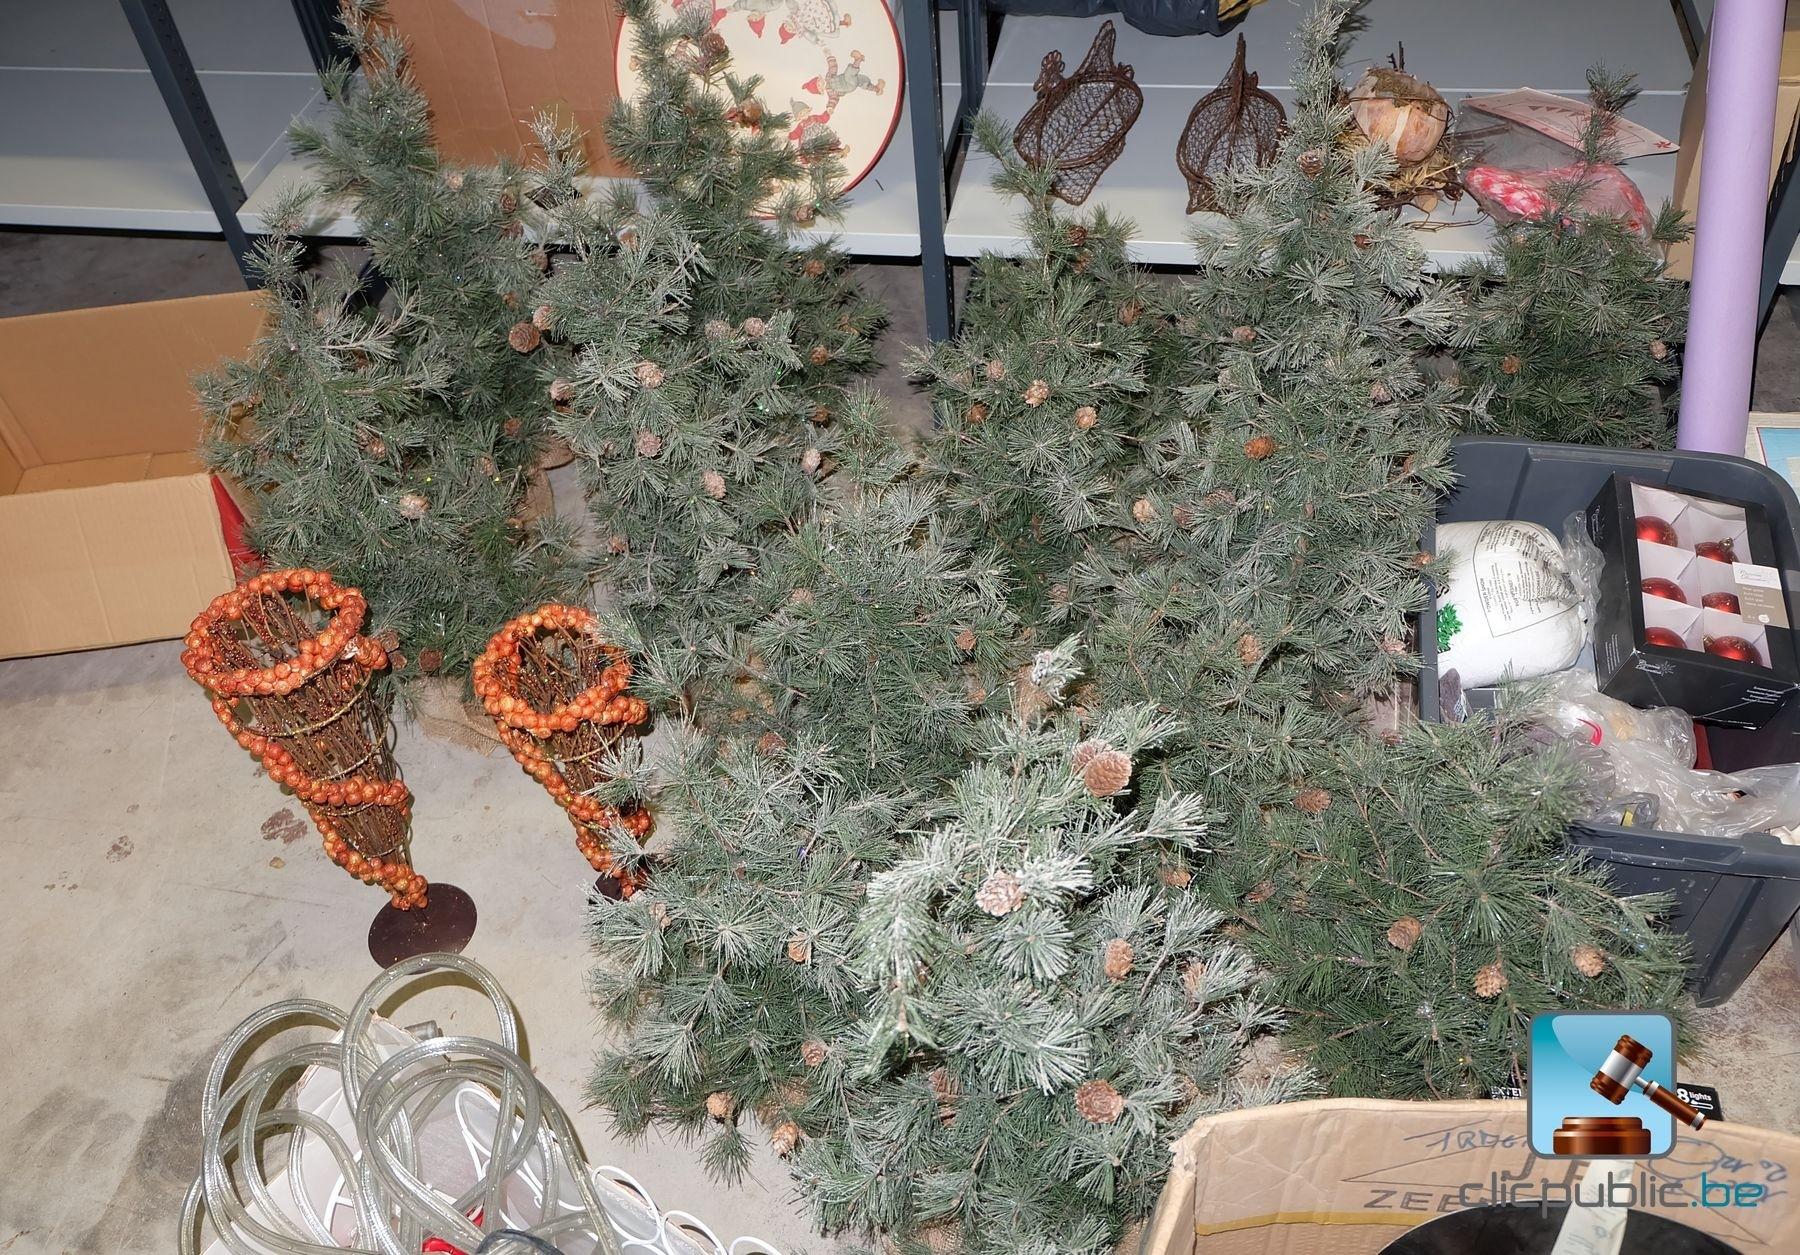 #9E4F2D Décorations De Noël (ref. 27) à Vendre Sur Clicpublic.be 5319 decorations de noel a vendre 1800x1255 px @ aertt.com